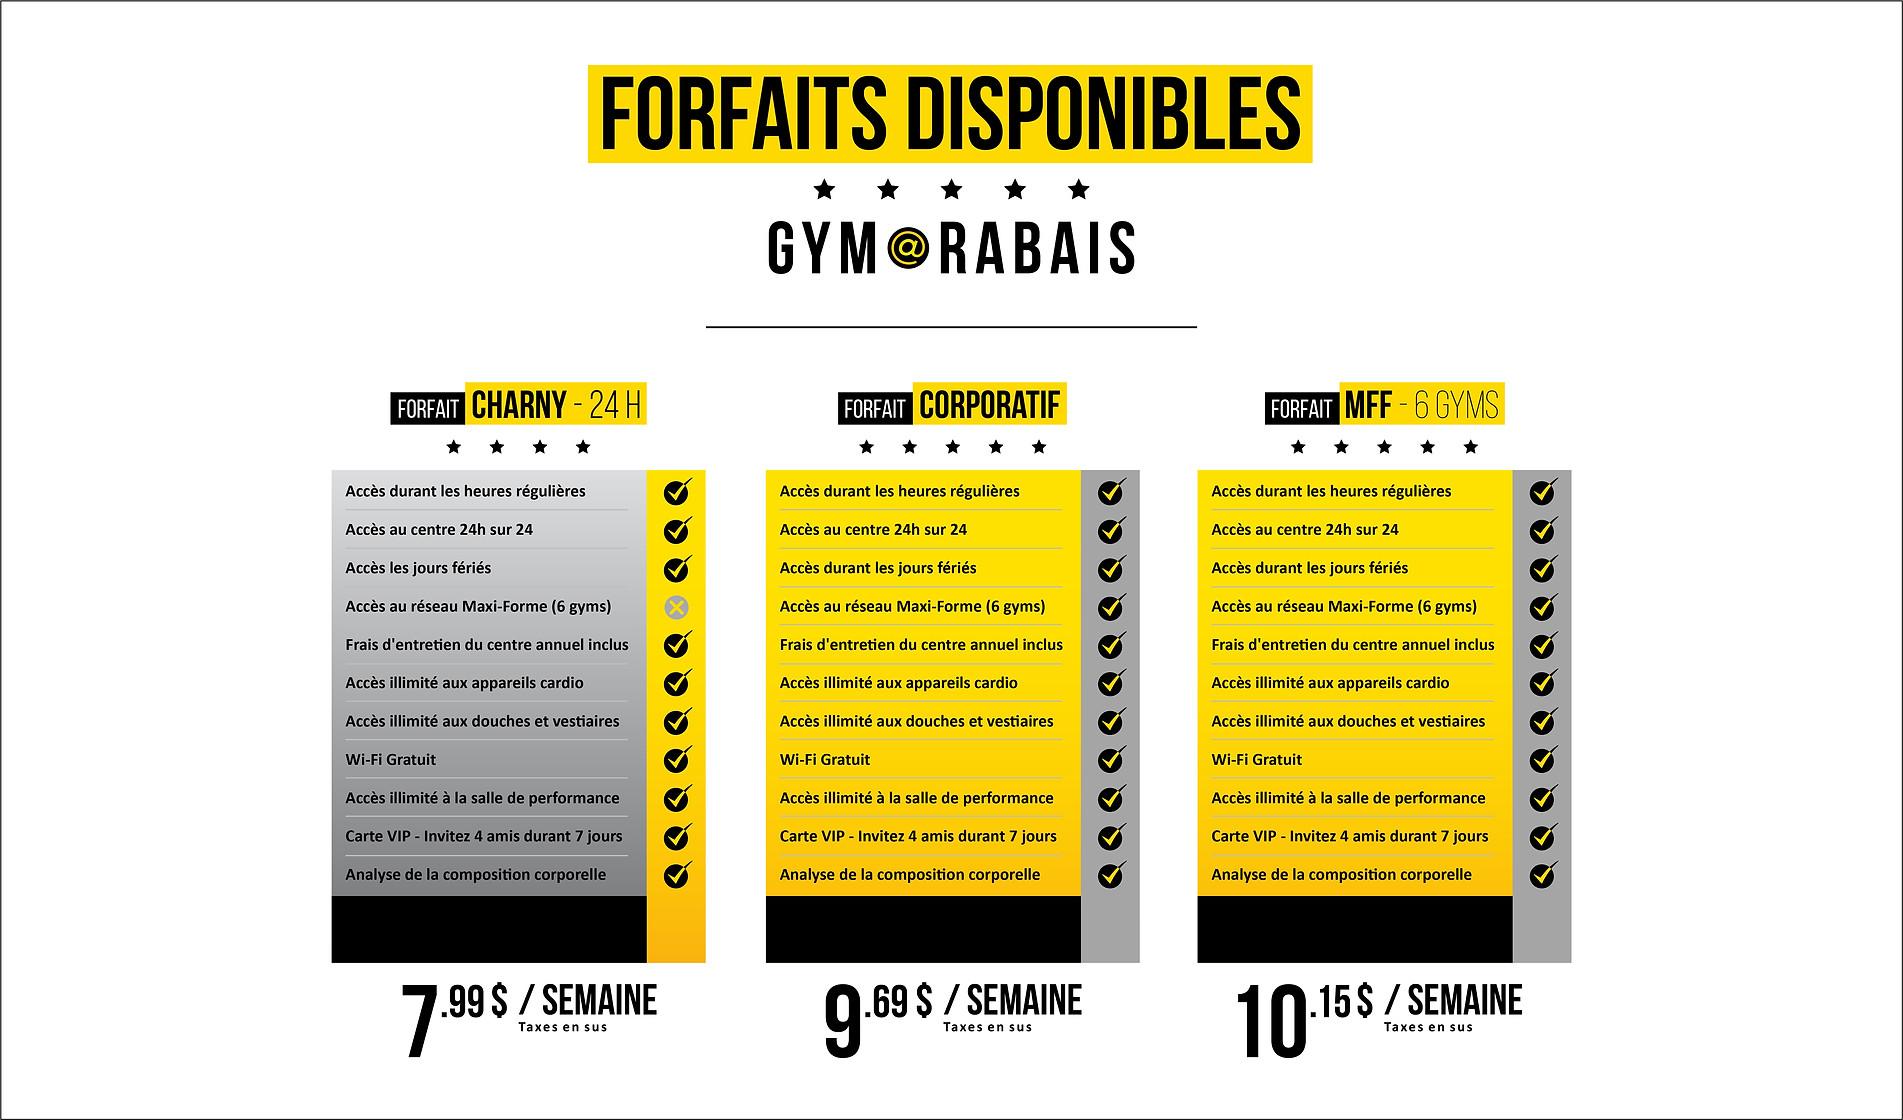 Gym@Rabais_ForfaitsDisponibles_2020_WEB_